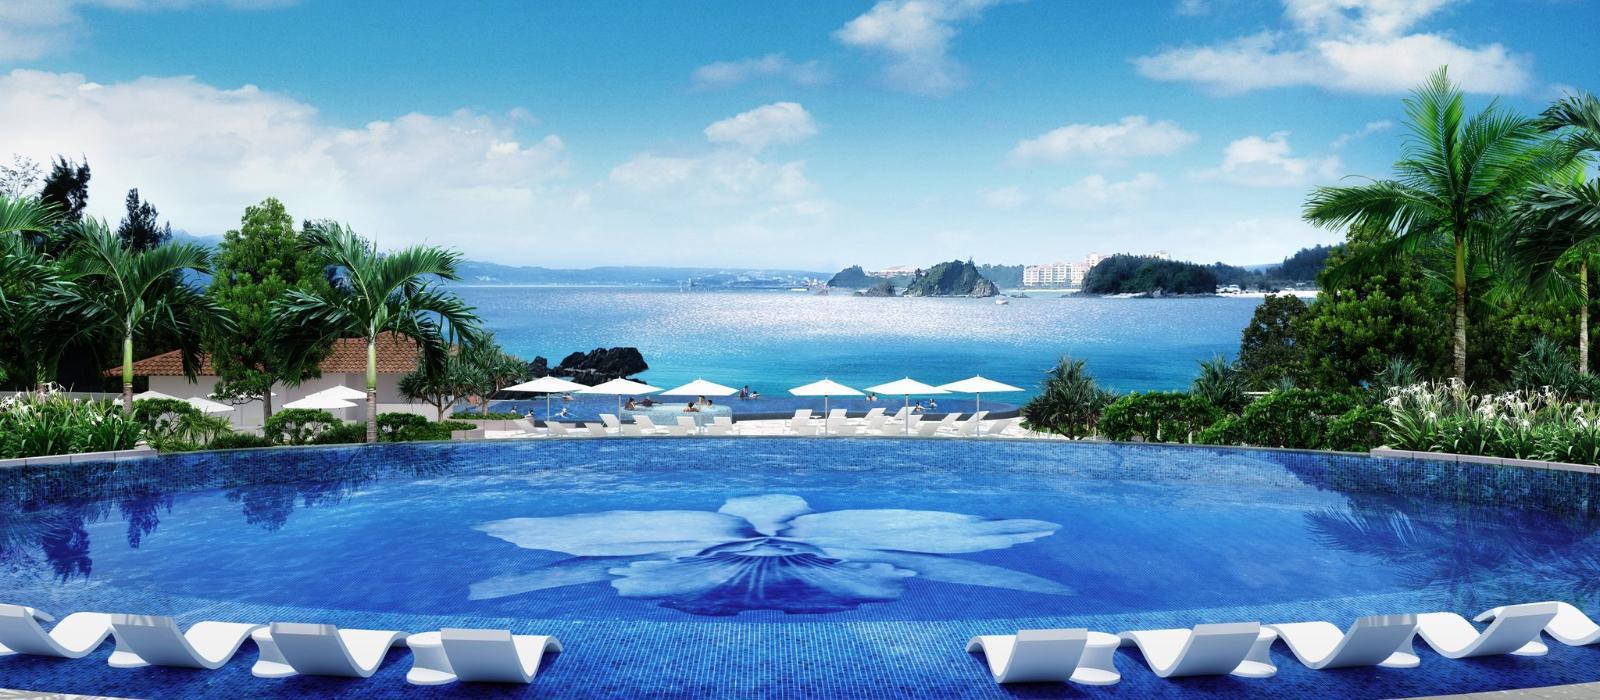 冲绳海丽客兰尼酒店(Halekulani Okinawa) 图片  www.lhw.cn